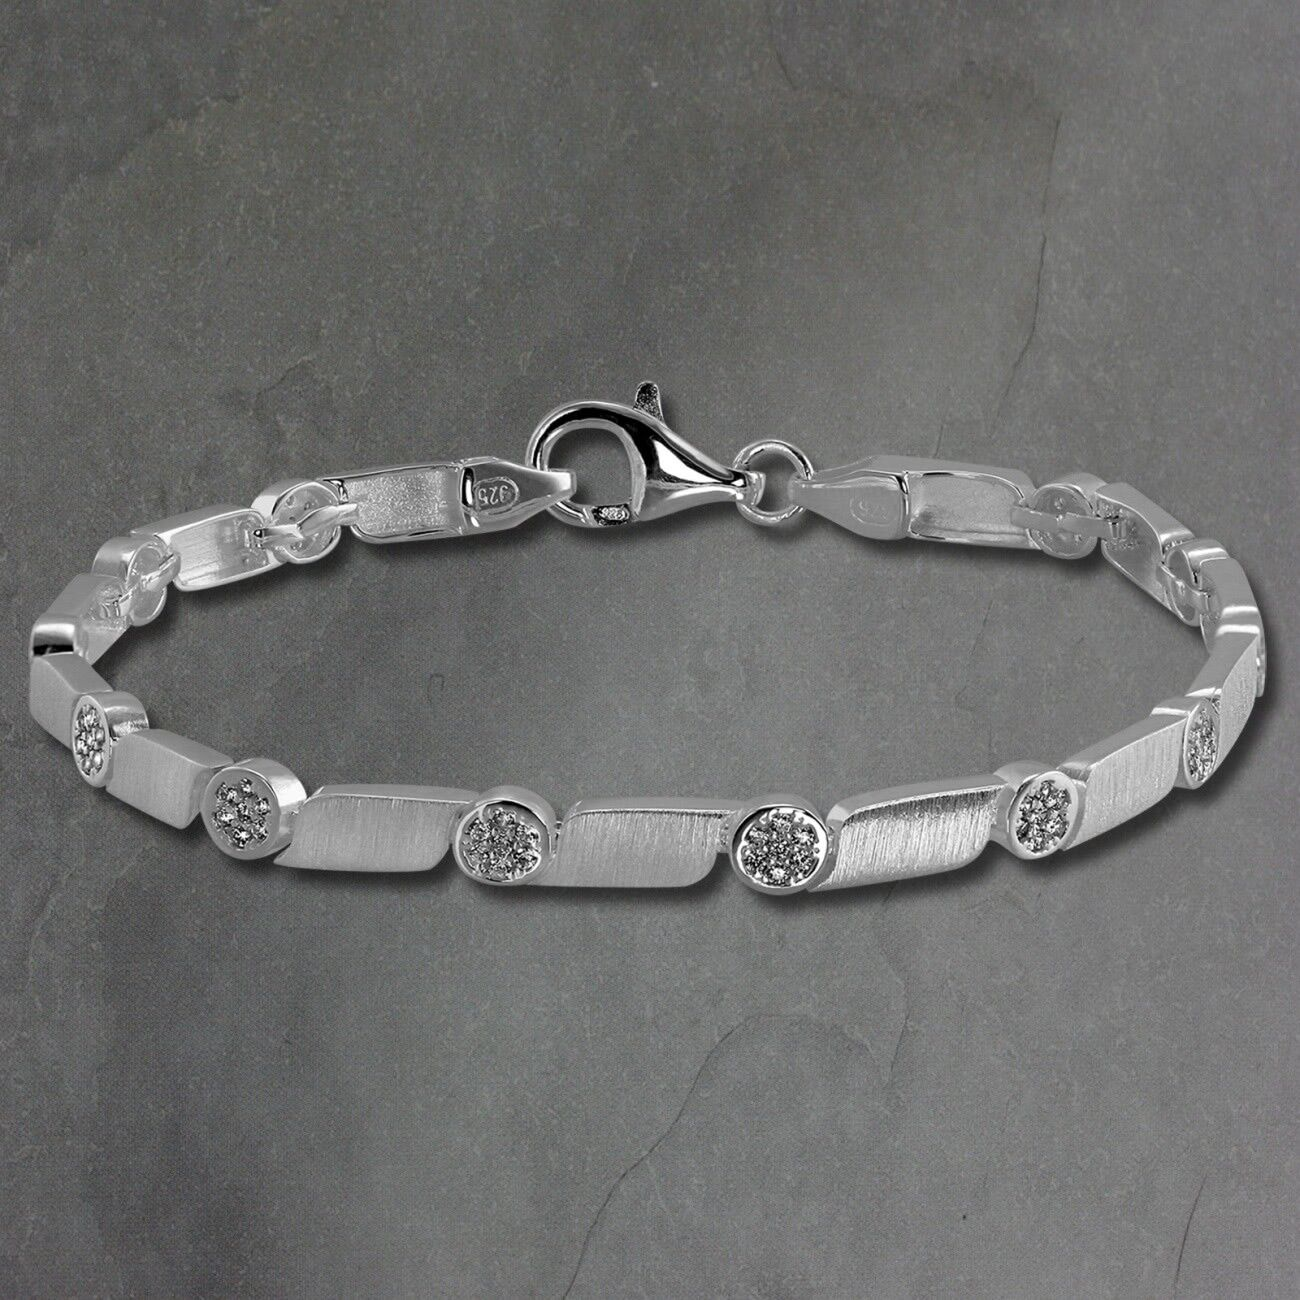 argentodream Bracciale Donna Donna Donna Fantasia argentoo 925 19cm Bianco Sda464w 55c3b1